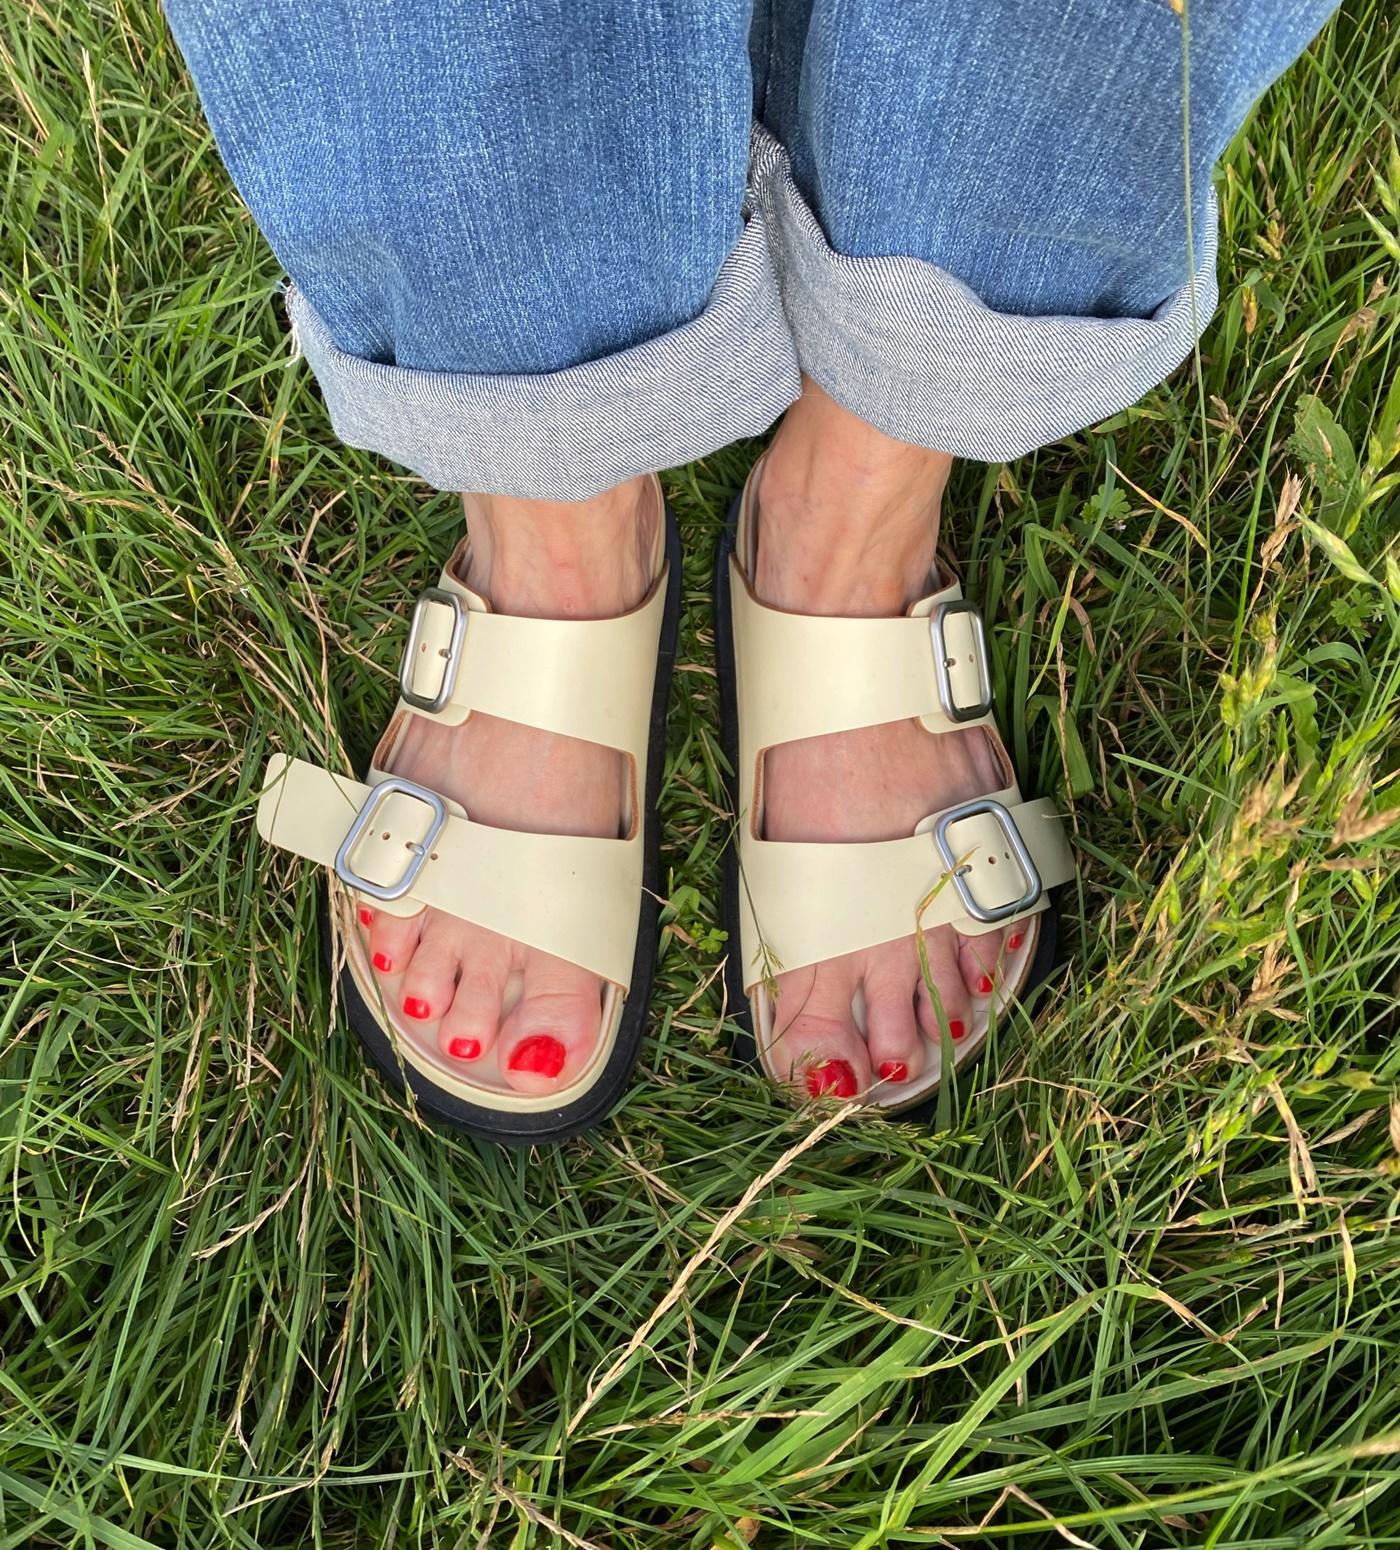 glamupyourlifestyle Birkenstock-Sandalen Jil-Sander ue-50-blog bequeme-Schuhe